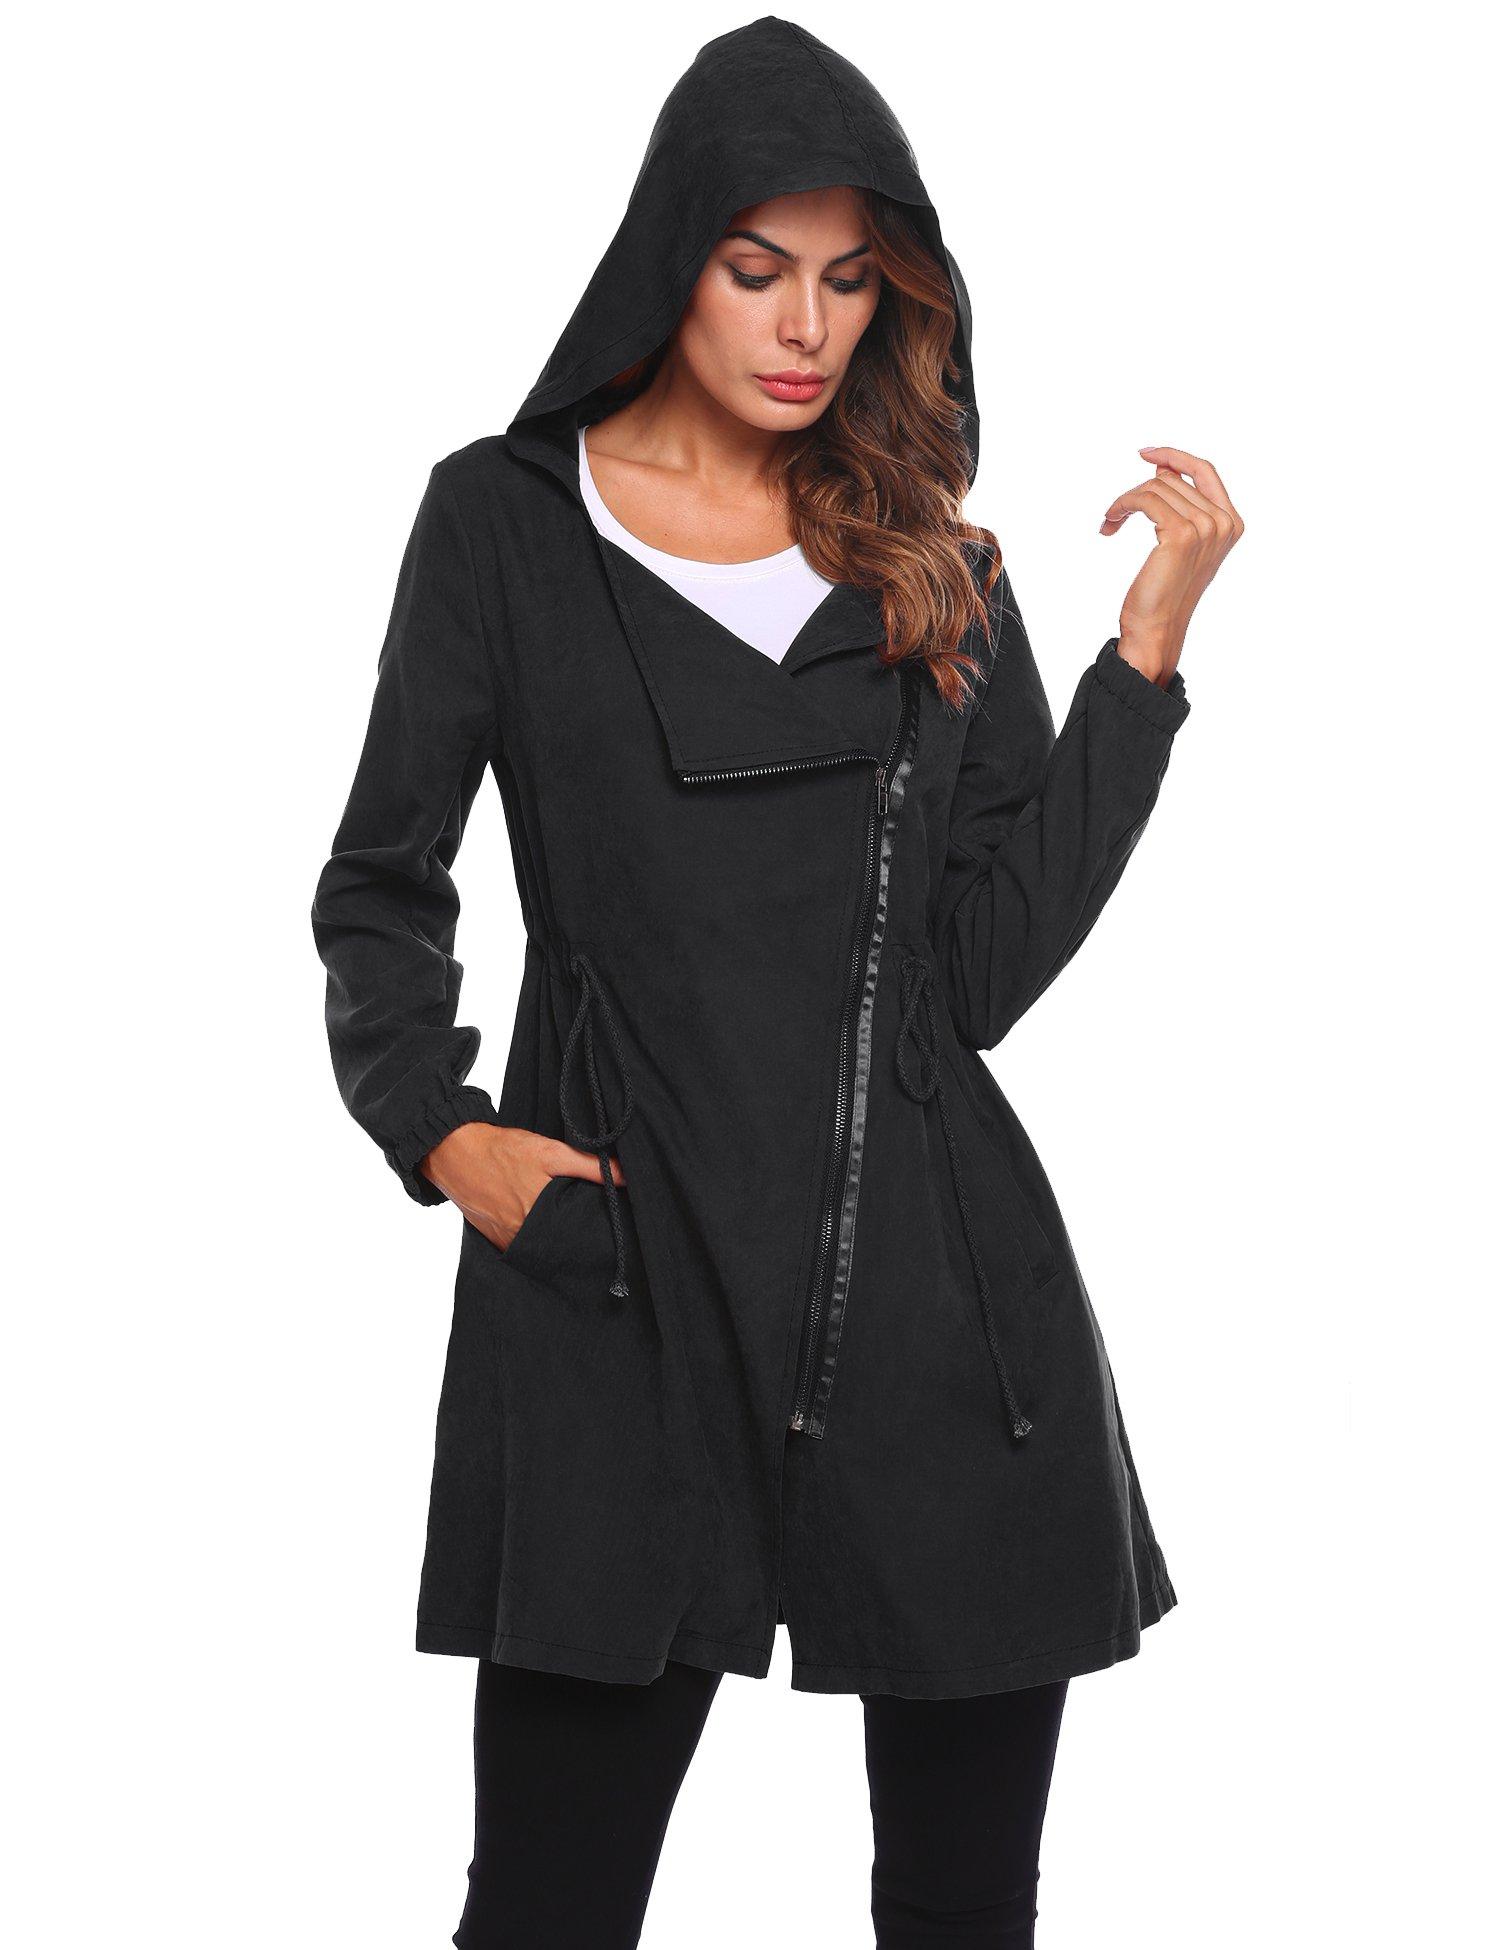 SE MIU Womens Hooded Asymmetric Zipper Drawstring Long Trench Coat Outerwear Jacket, Large, Black